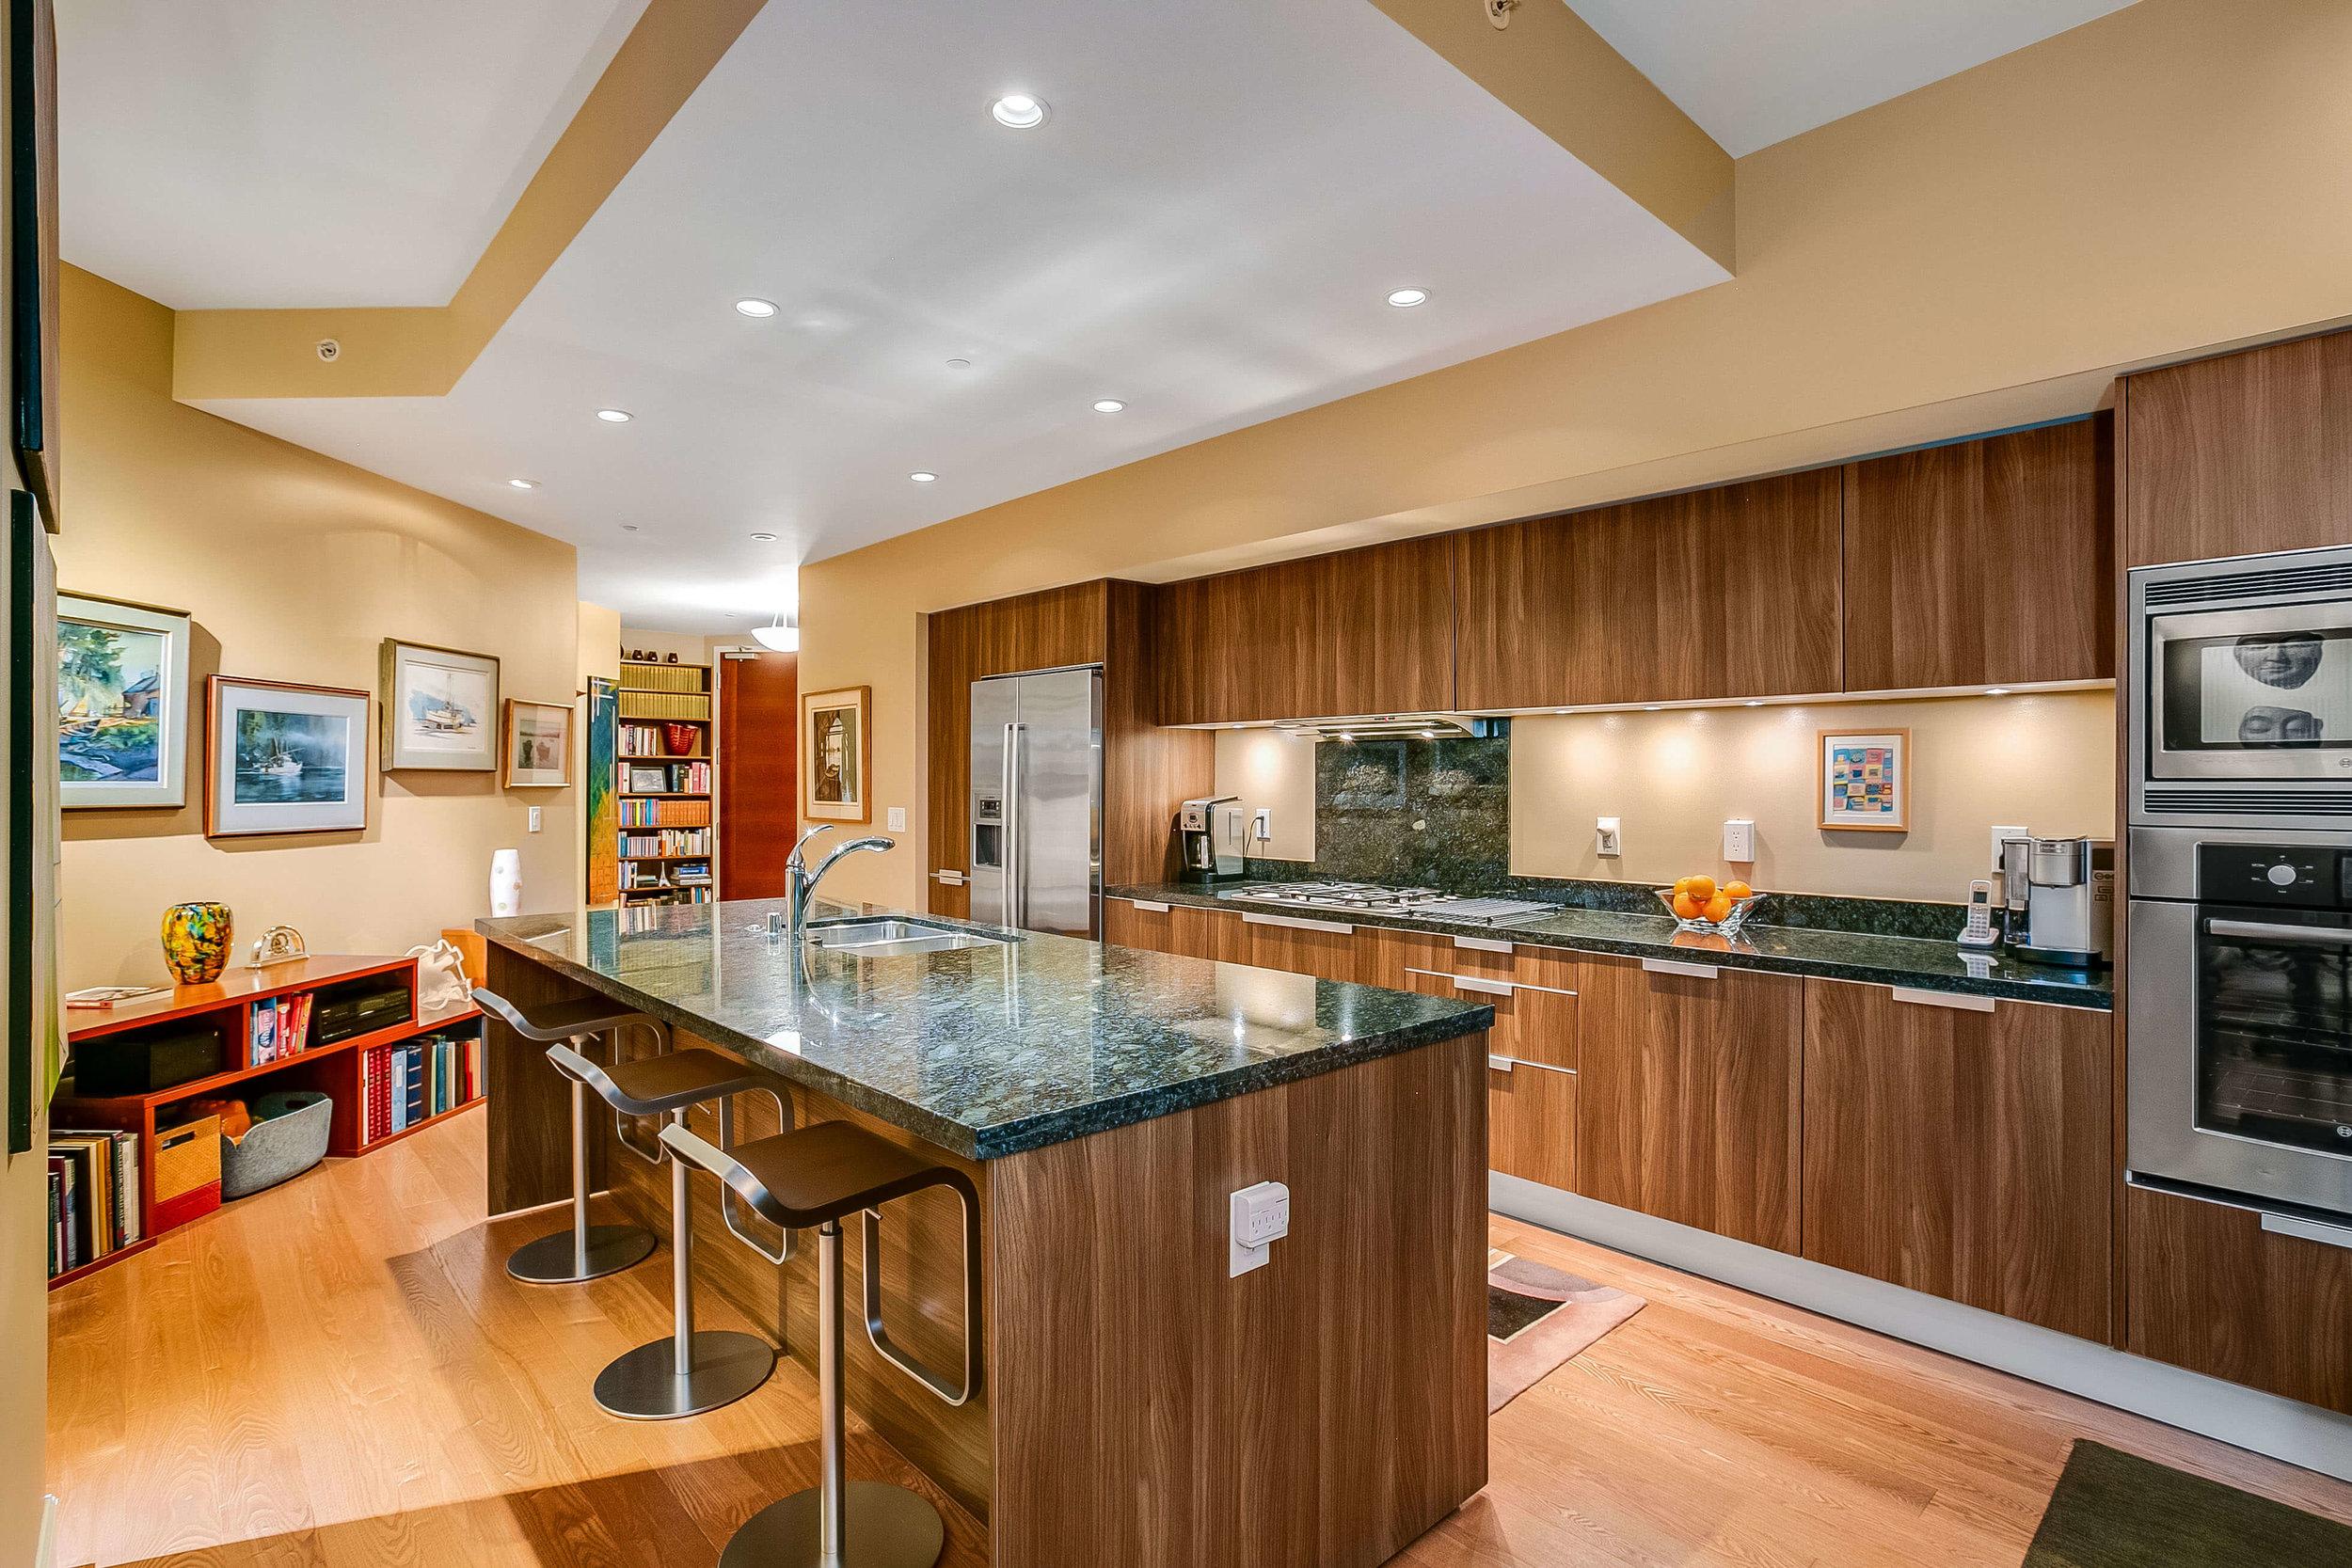 Escala-Condo-1208-For-Sale-Luxury-Kitchen.jpg